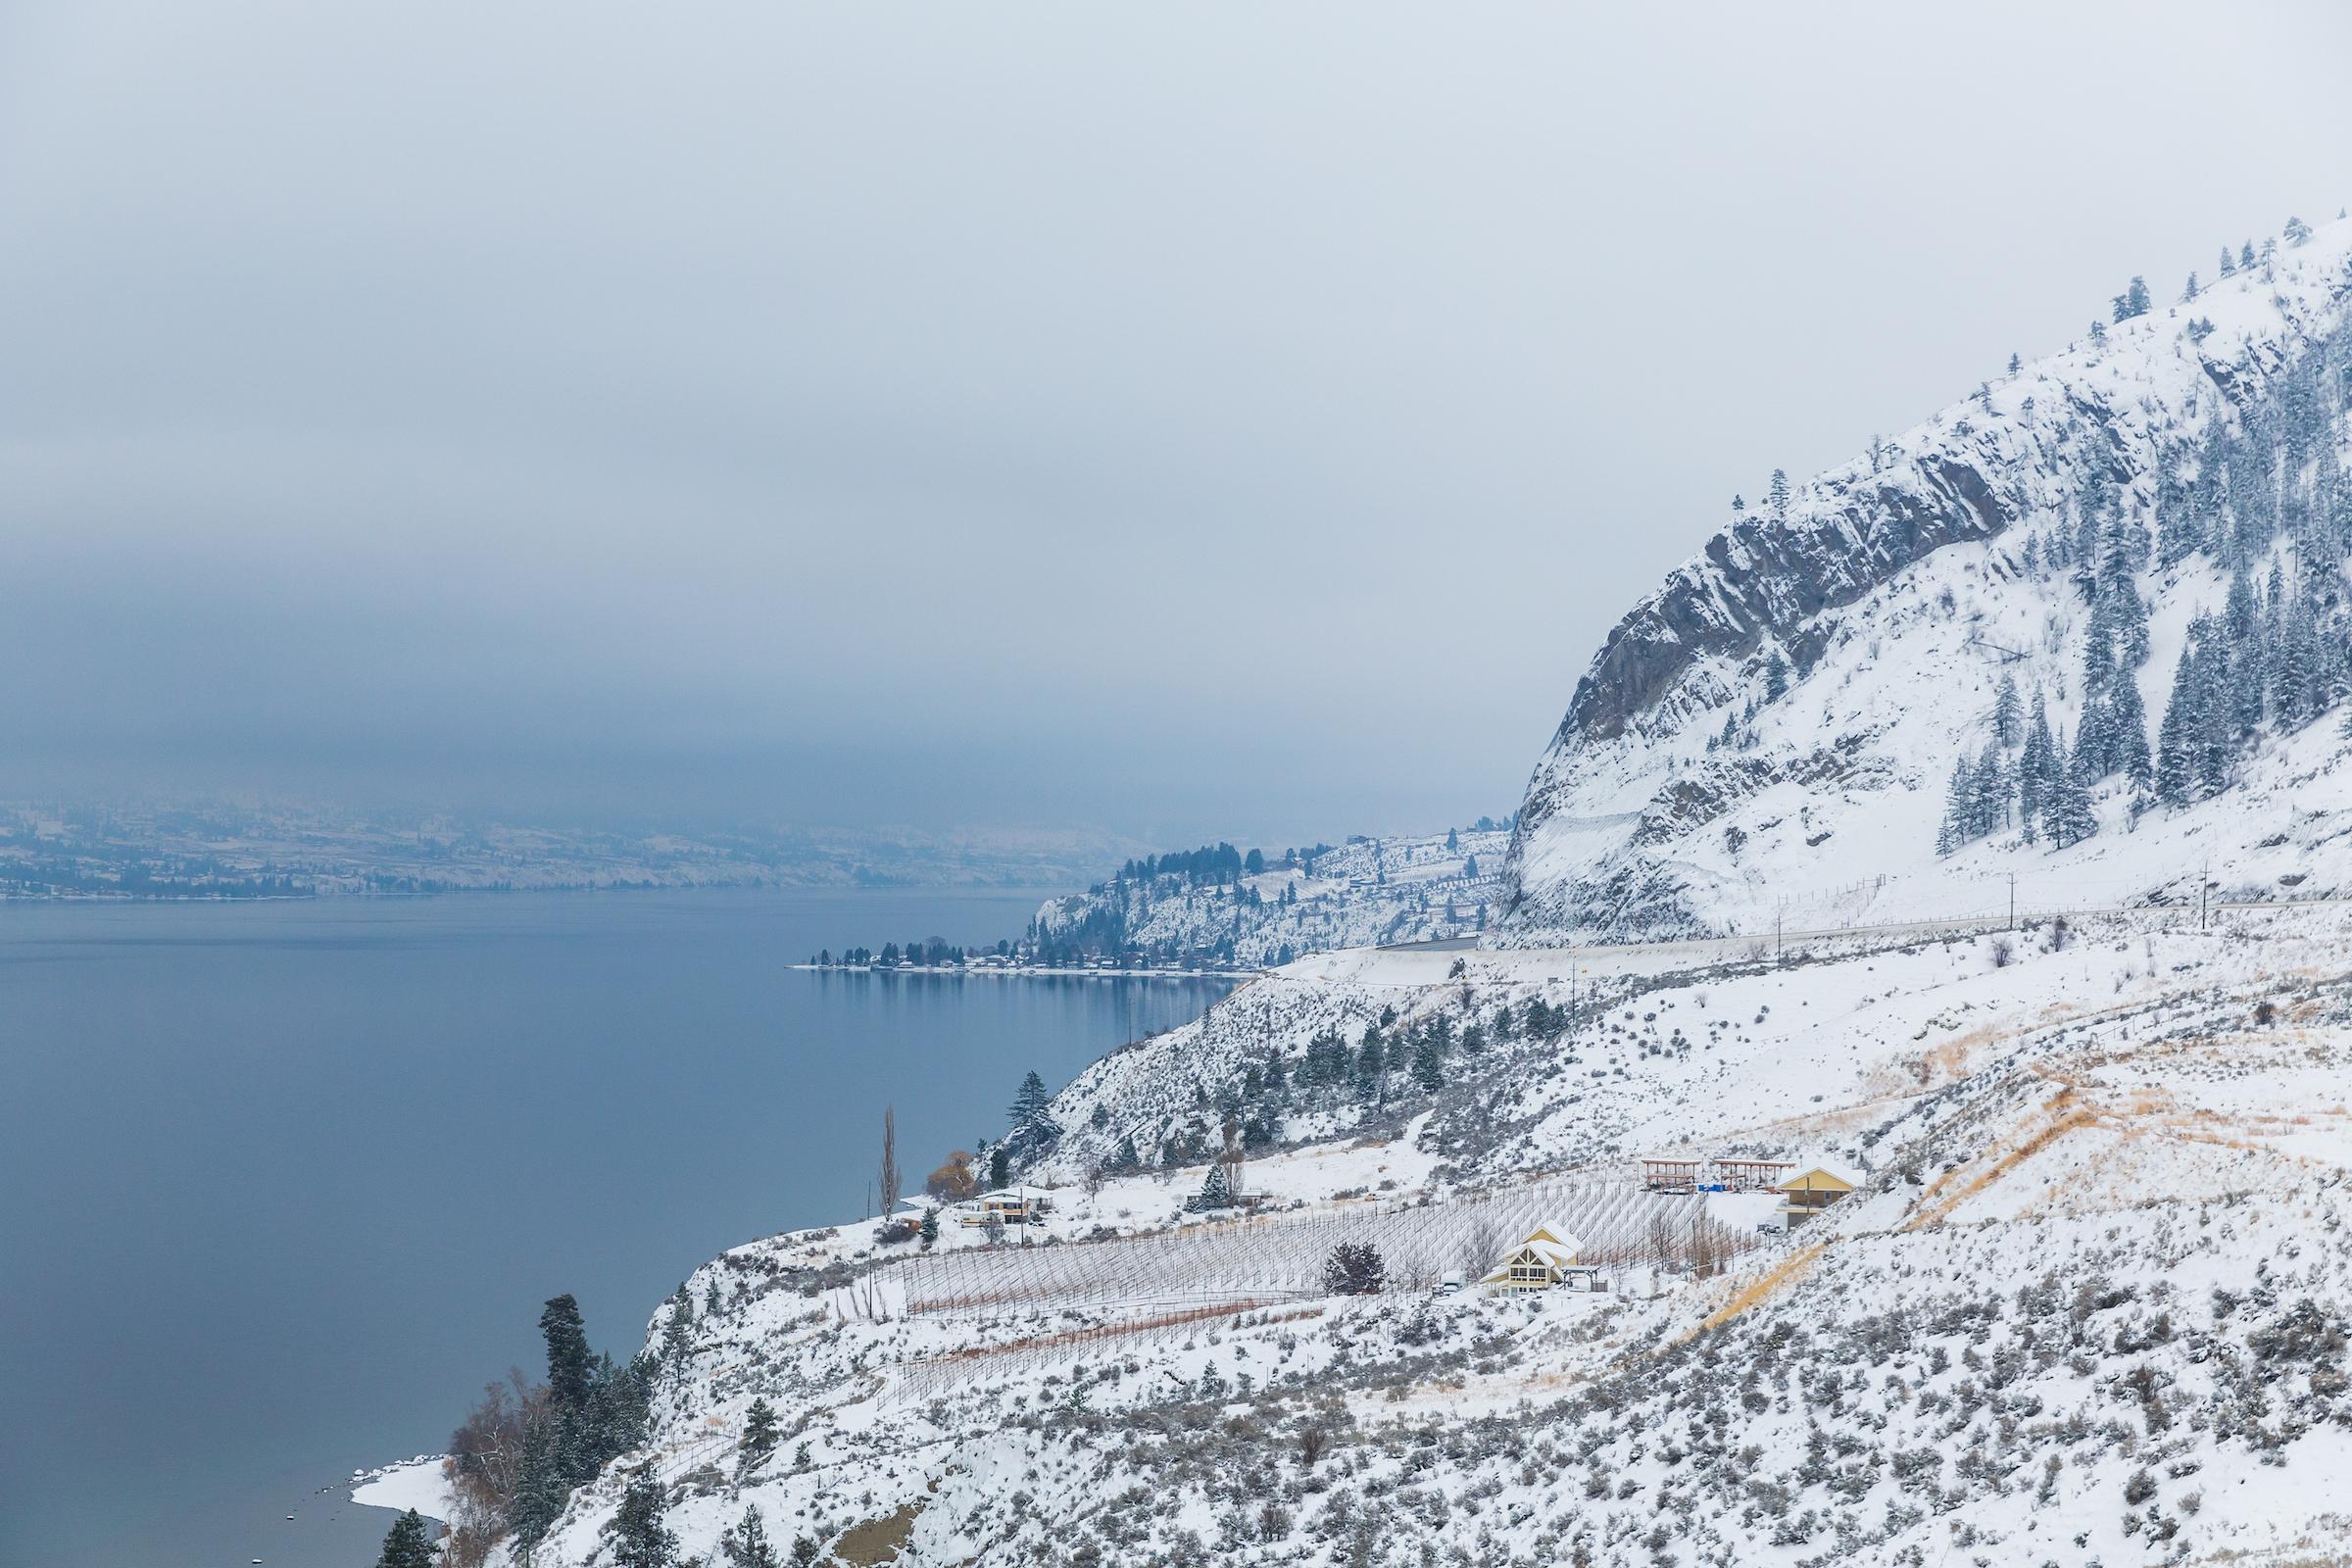 Winter happenings in Penticton, BC